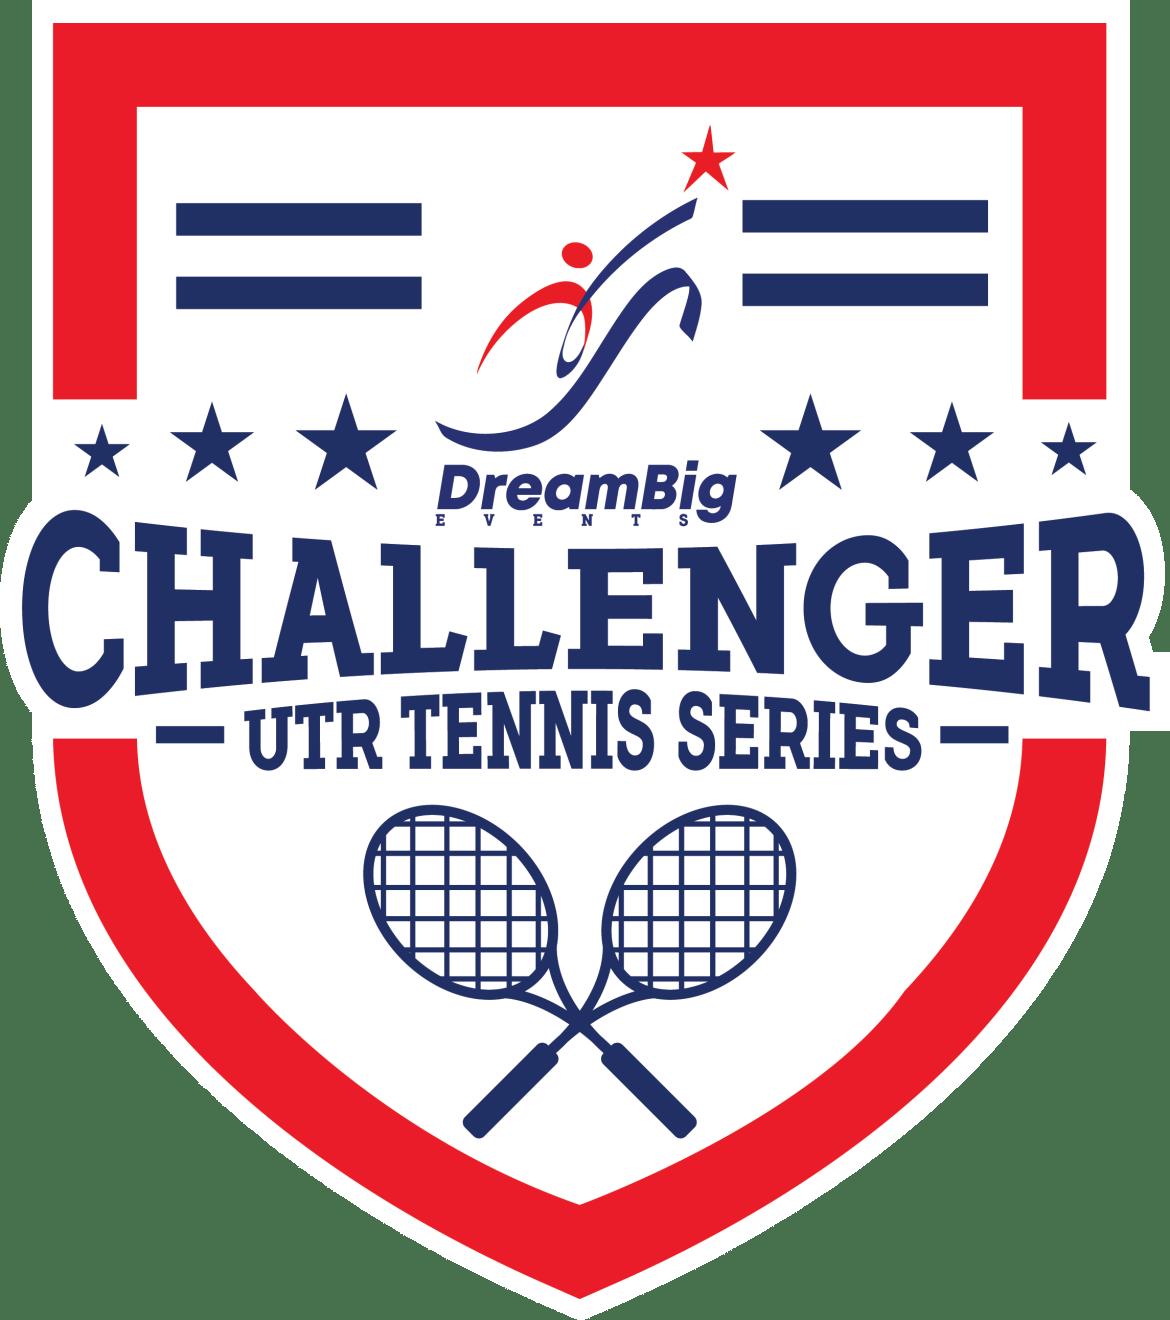 UTR Challenger Series Logo